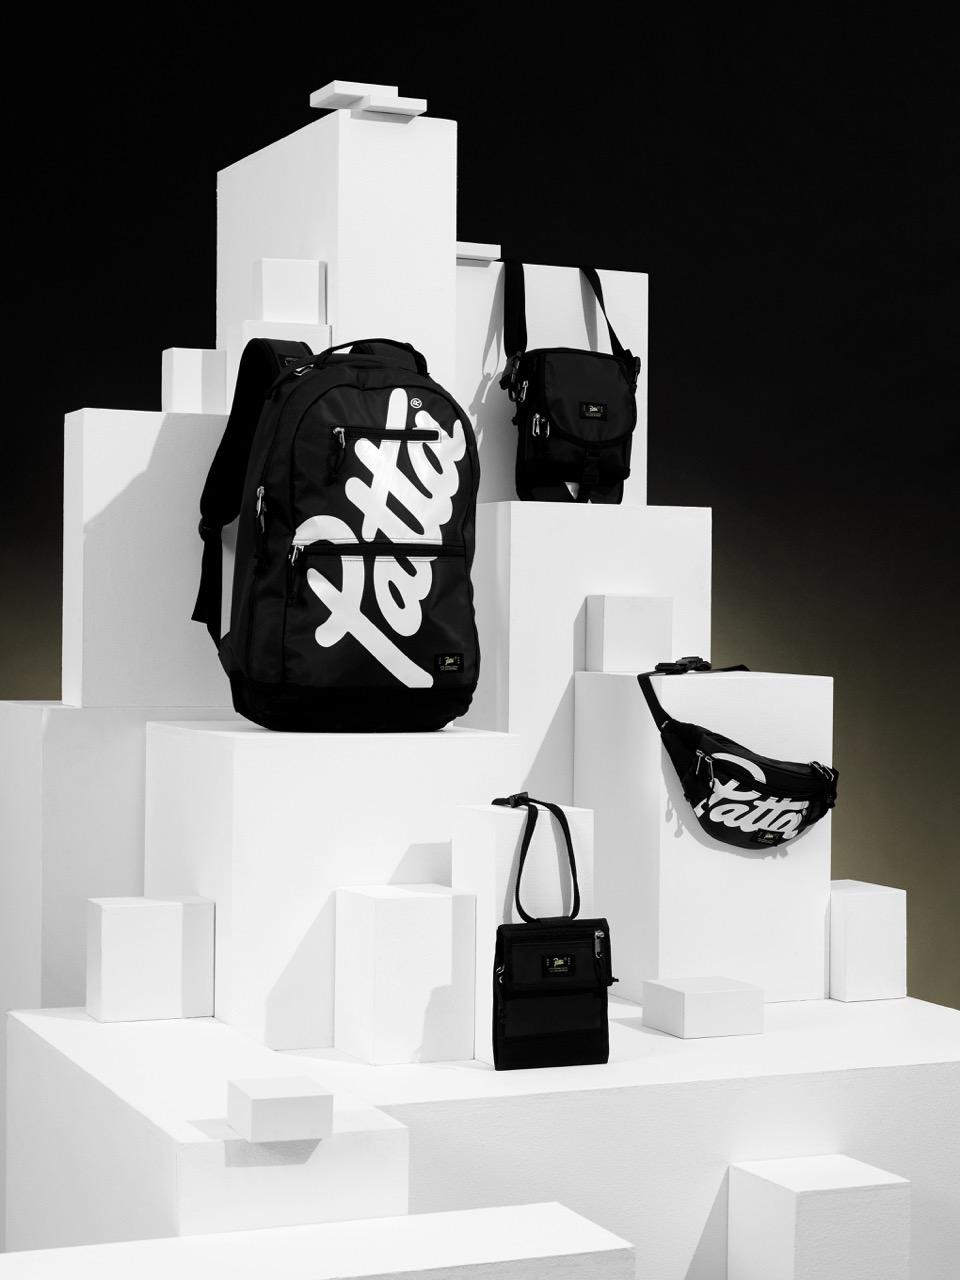 patta mochilas bolsas outono inverno 2017 01 - 5 anos de Streetwear Brasil